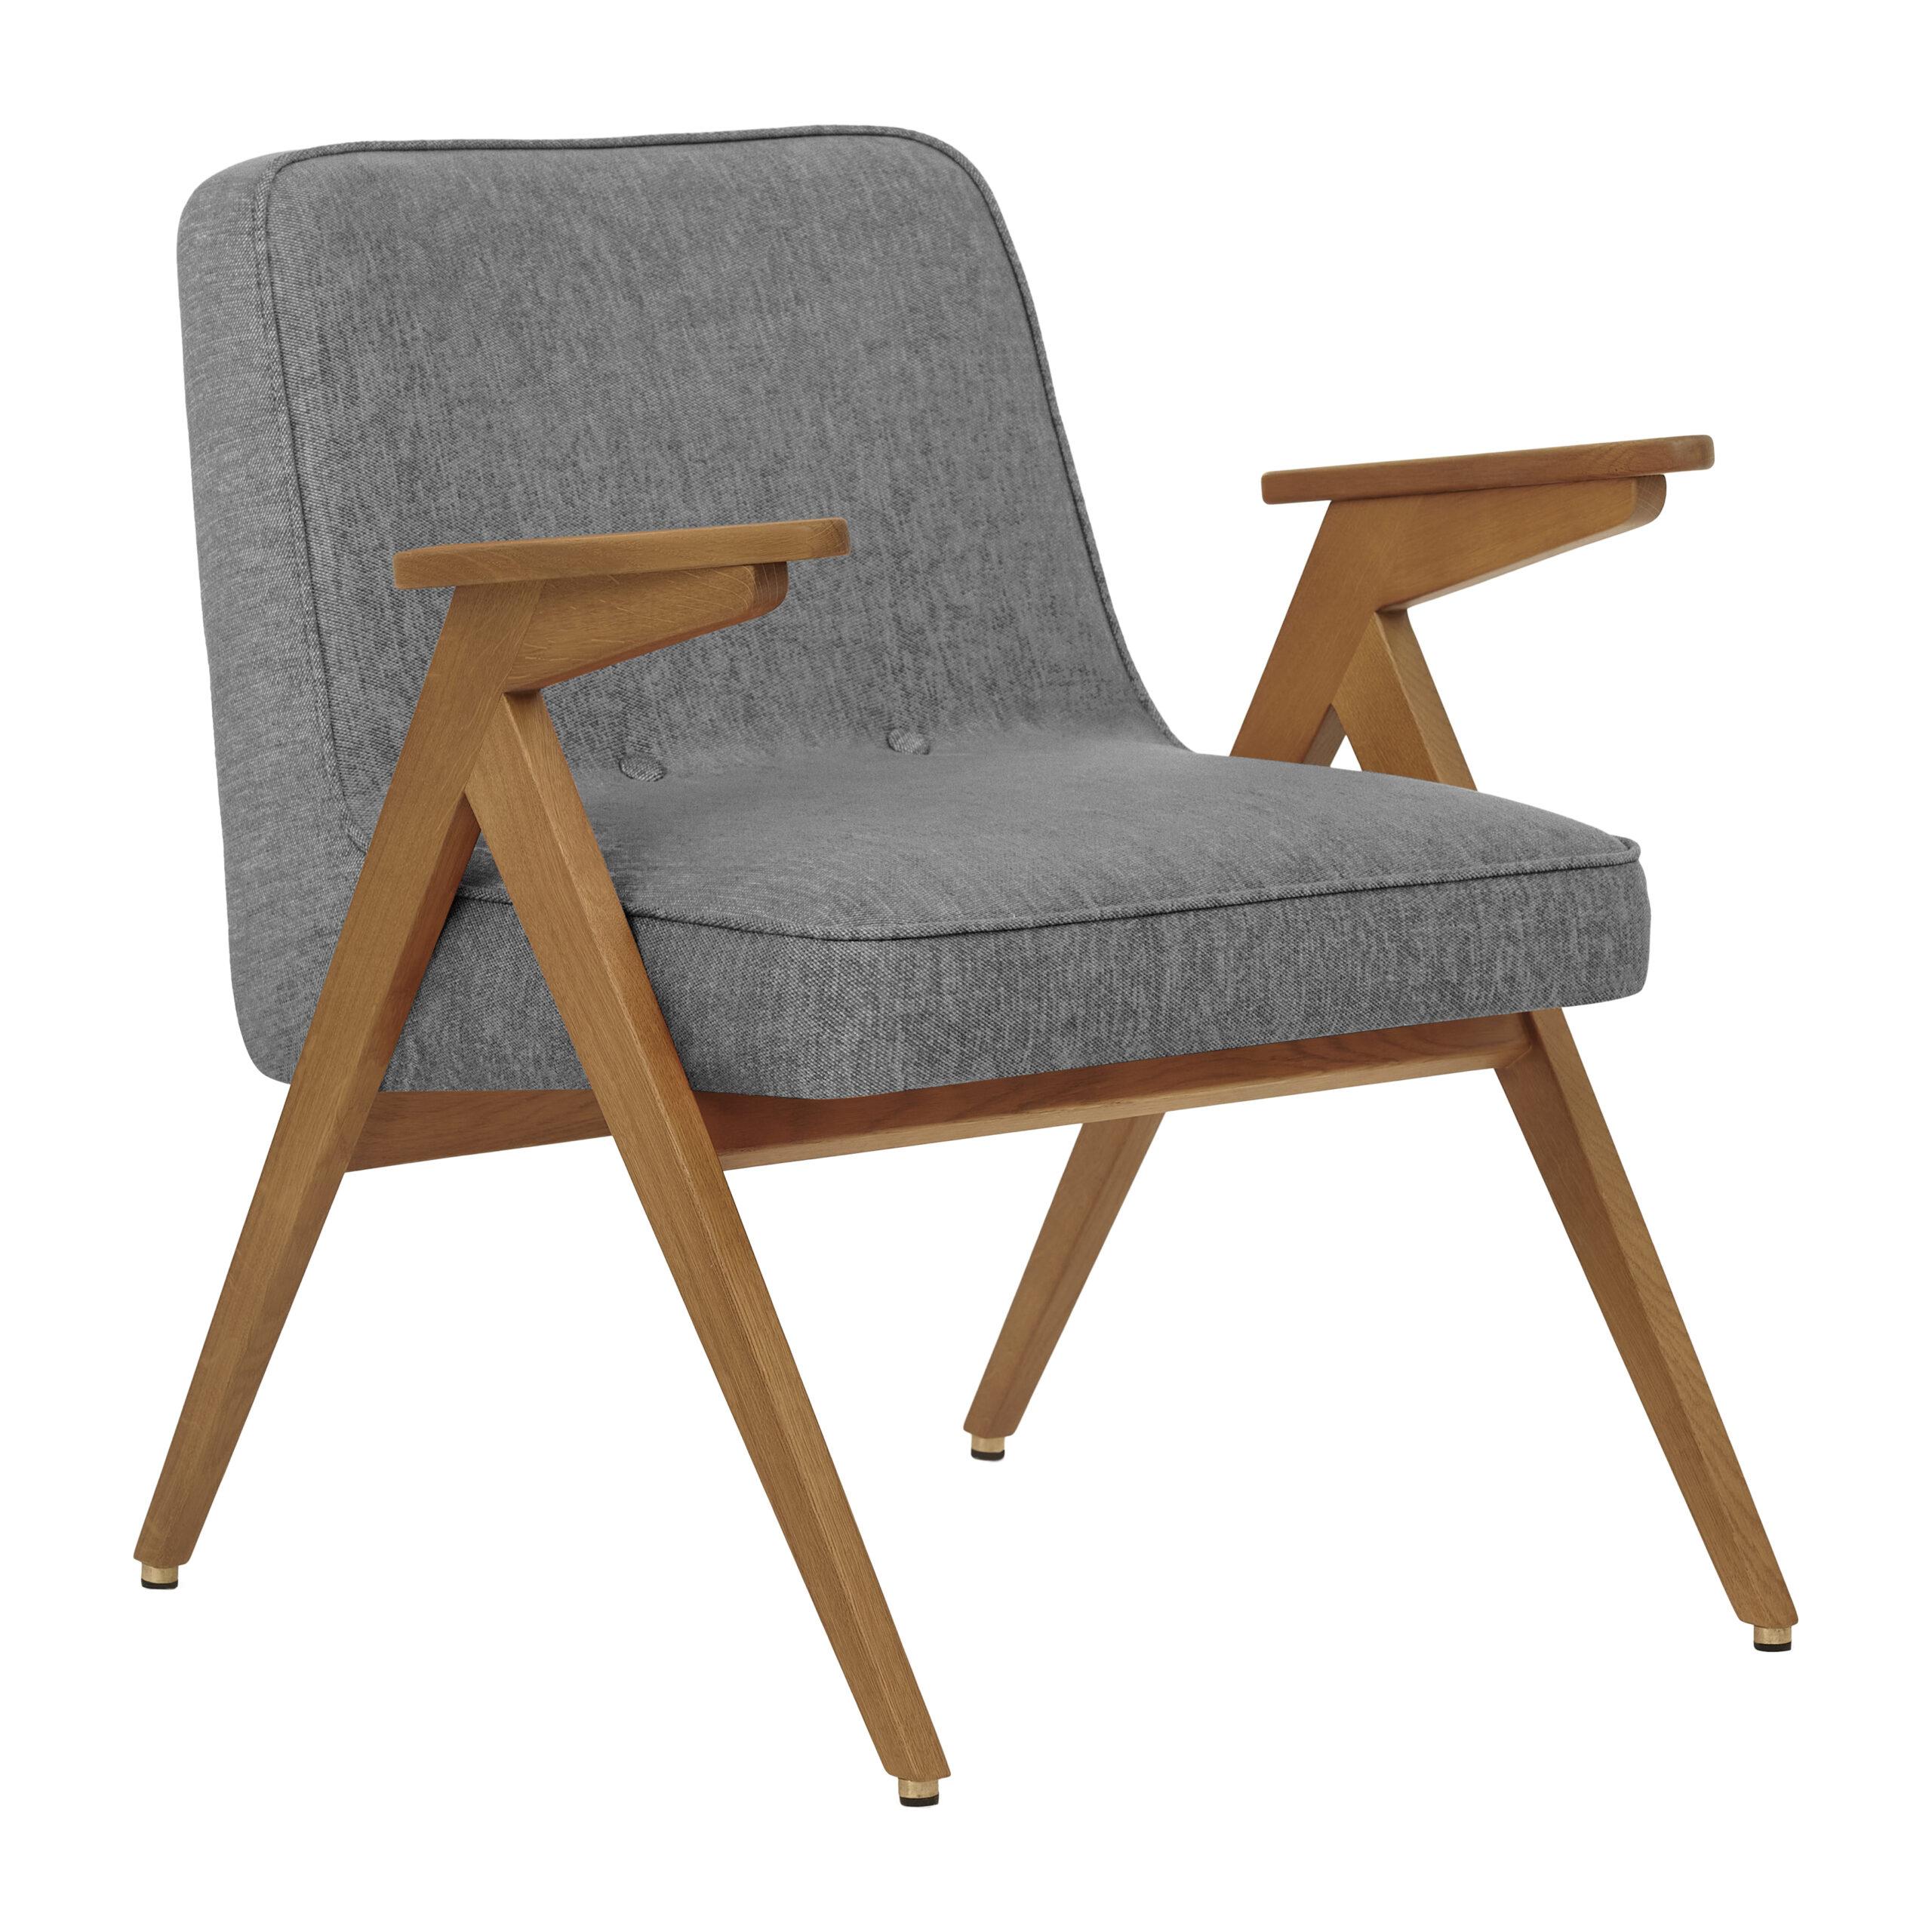 sessel, mobel, wohnen, schaukelstuehle, greenery, SESSEL 366 BUNNY LOFT - 366 Concept Bunny Armchair W03 Loft Silver scaled